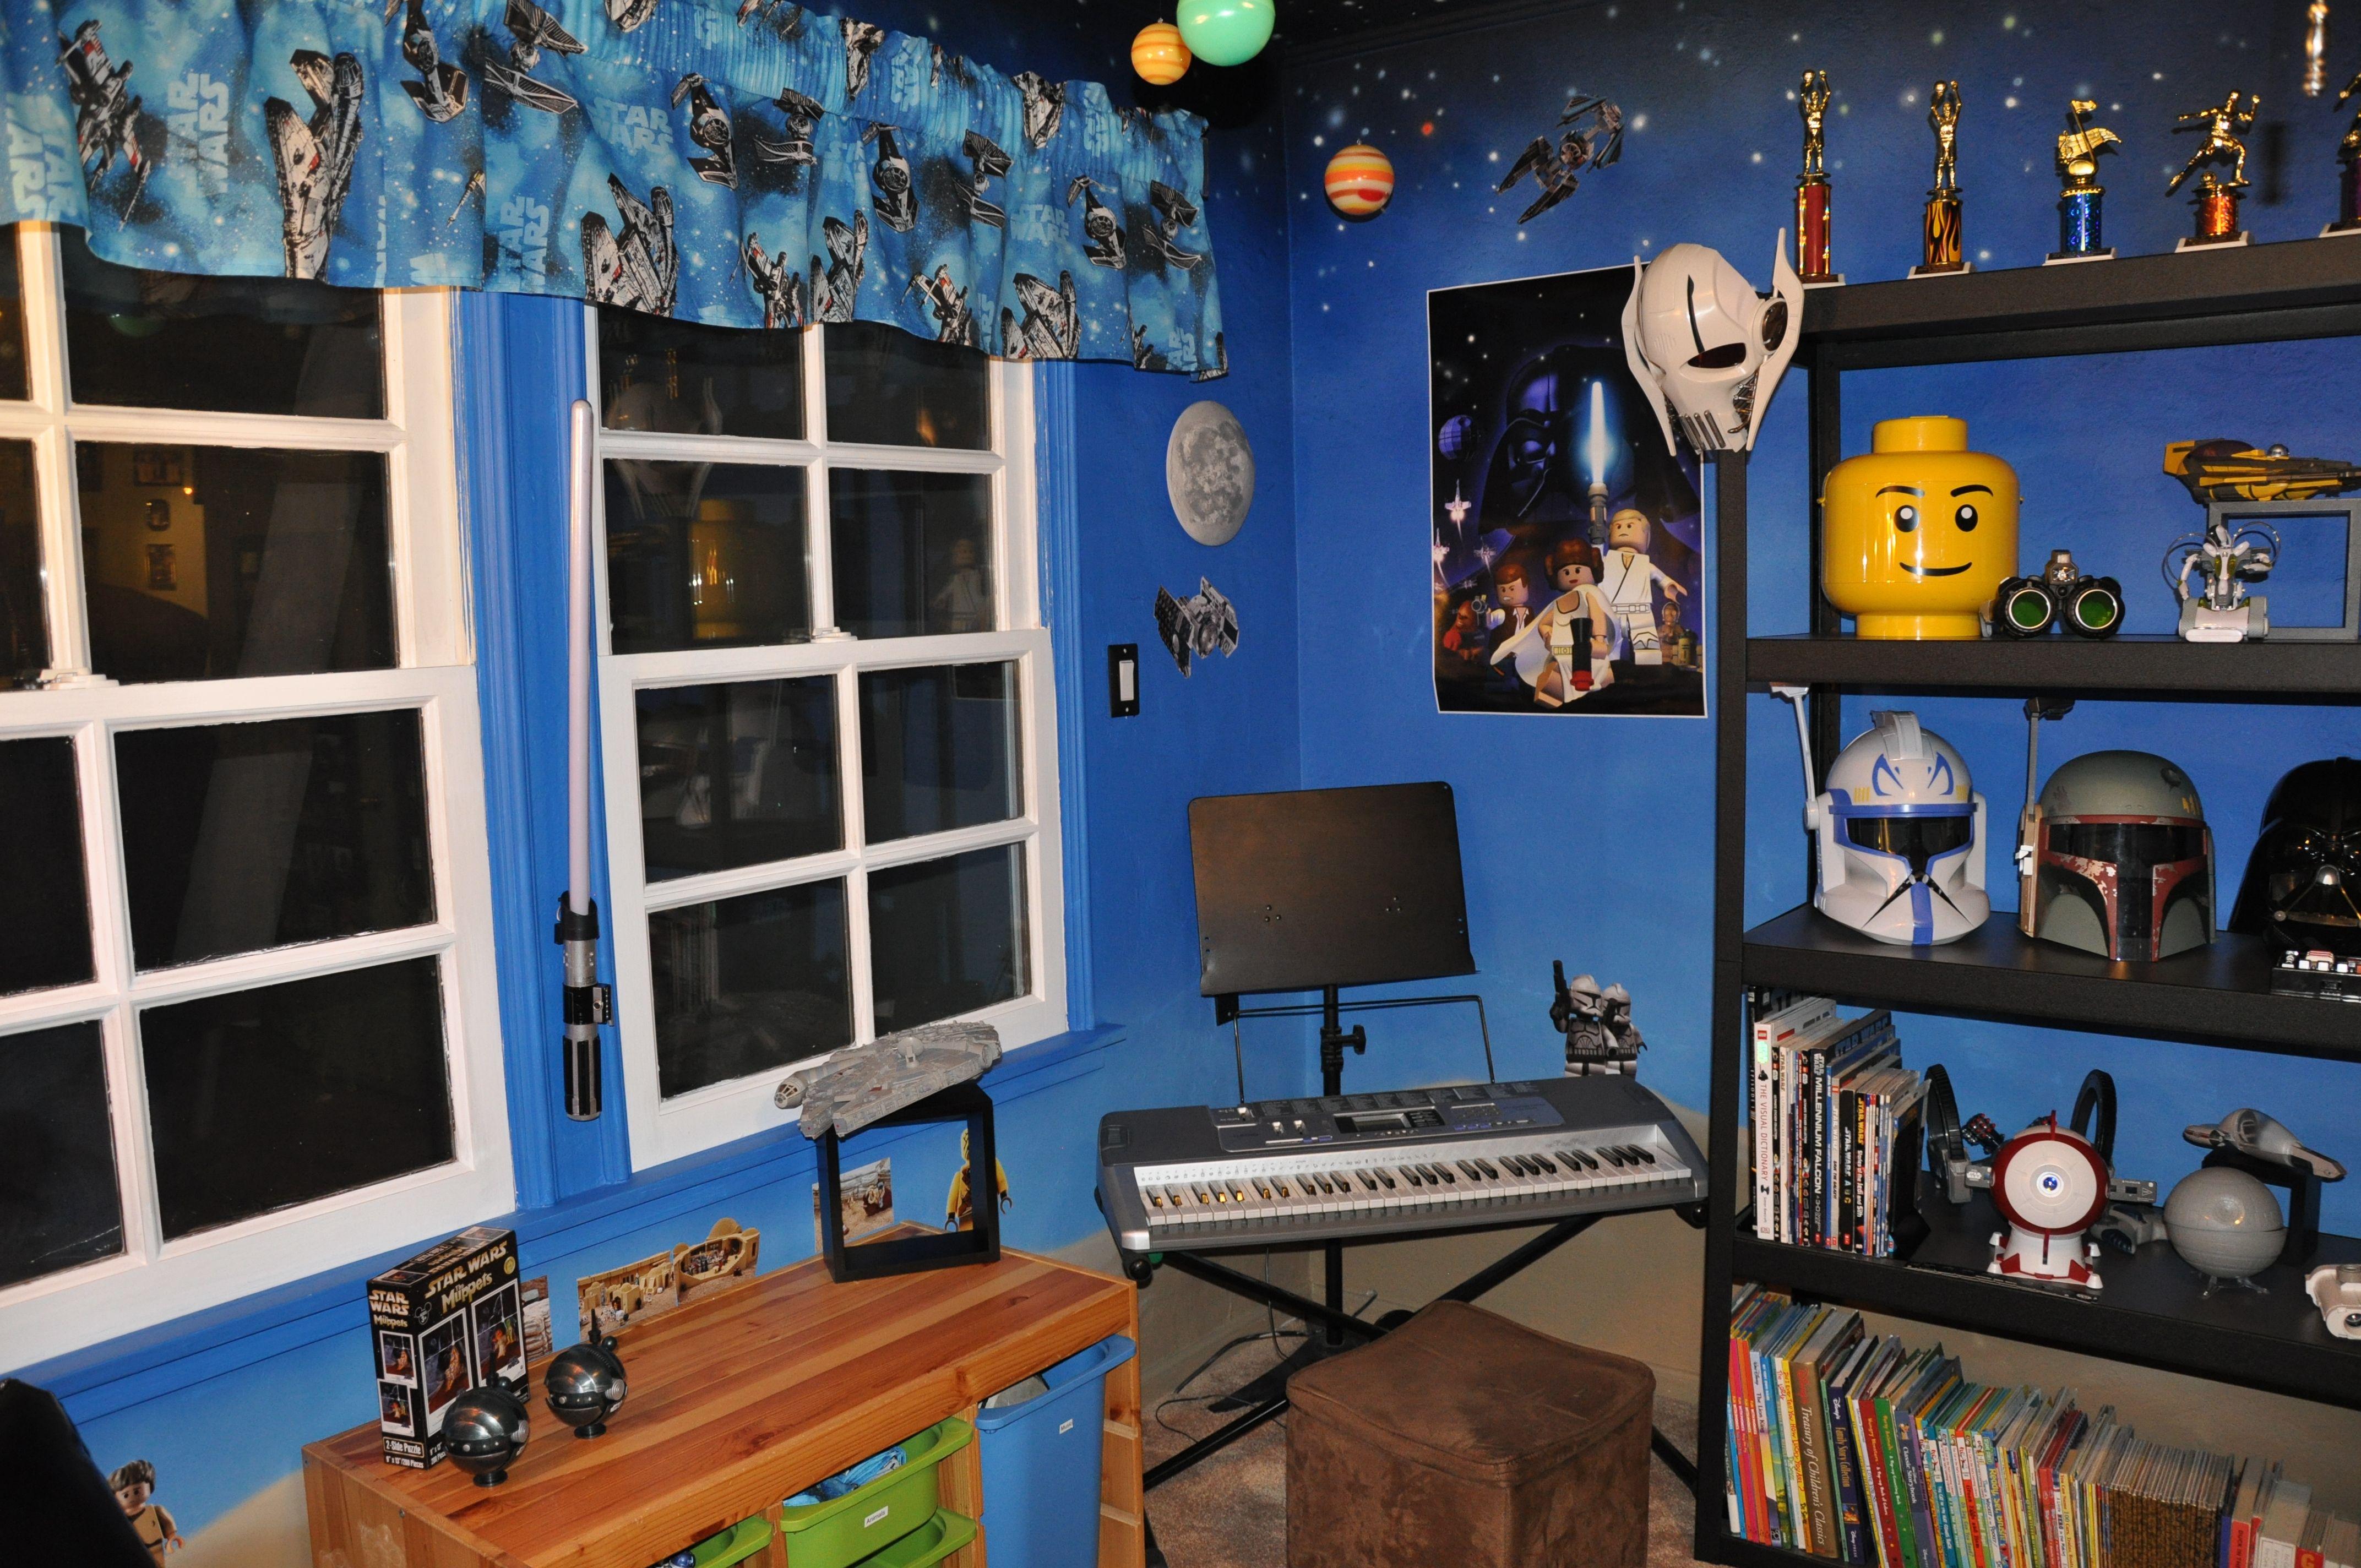 lego star wars room like the wall paint kid s room pinterest lego star wars room like the wall paint